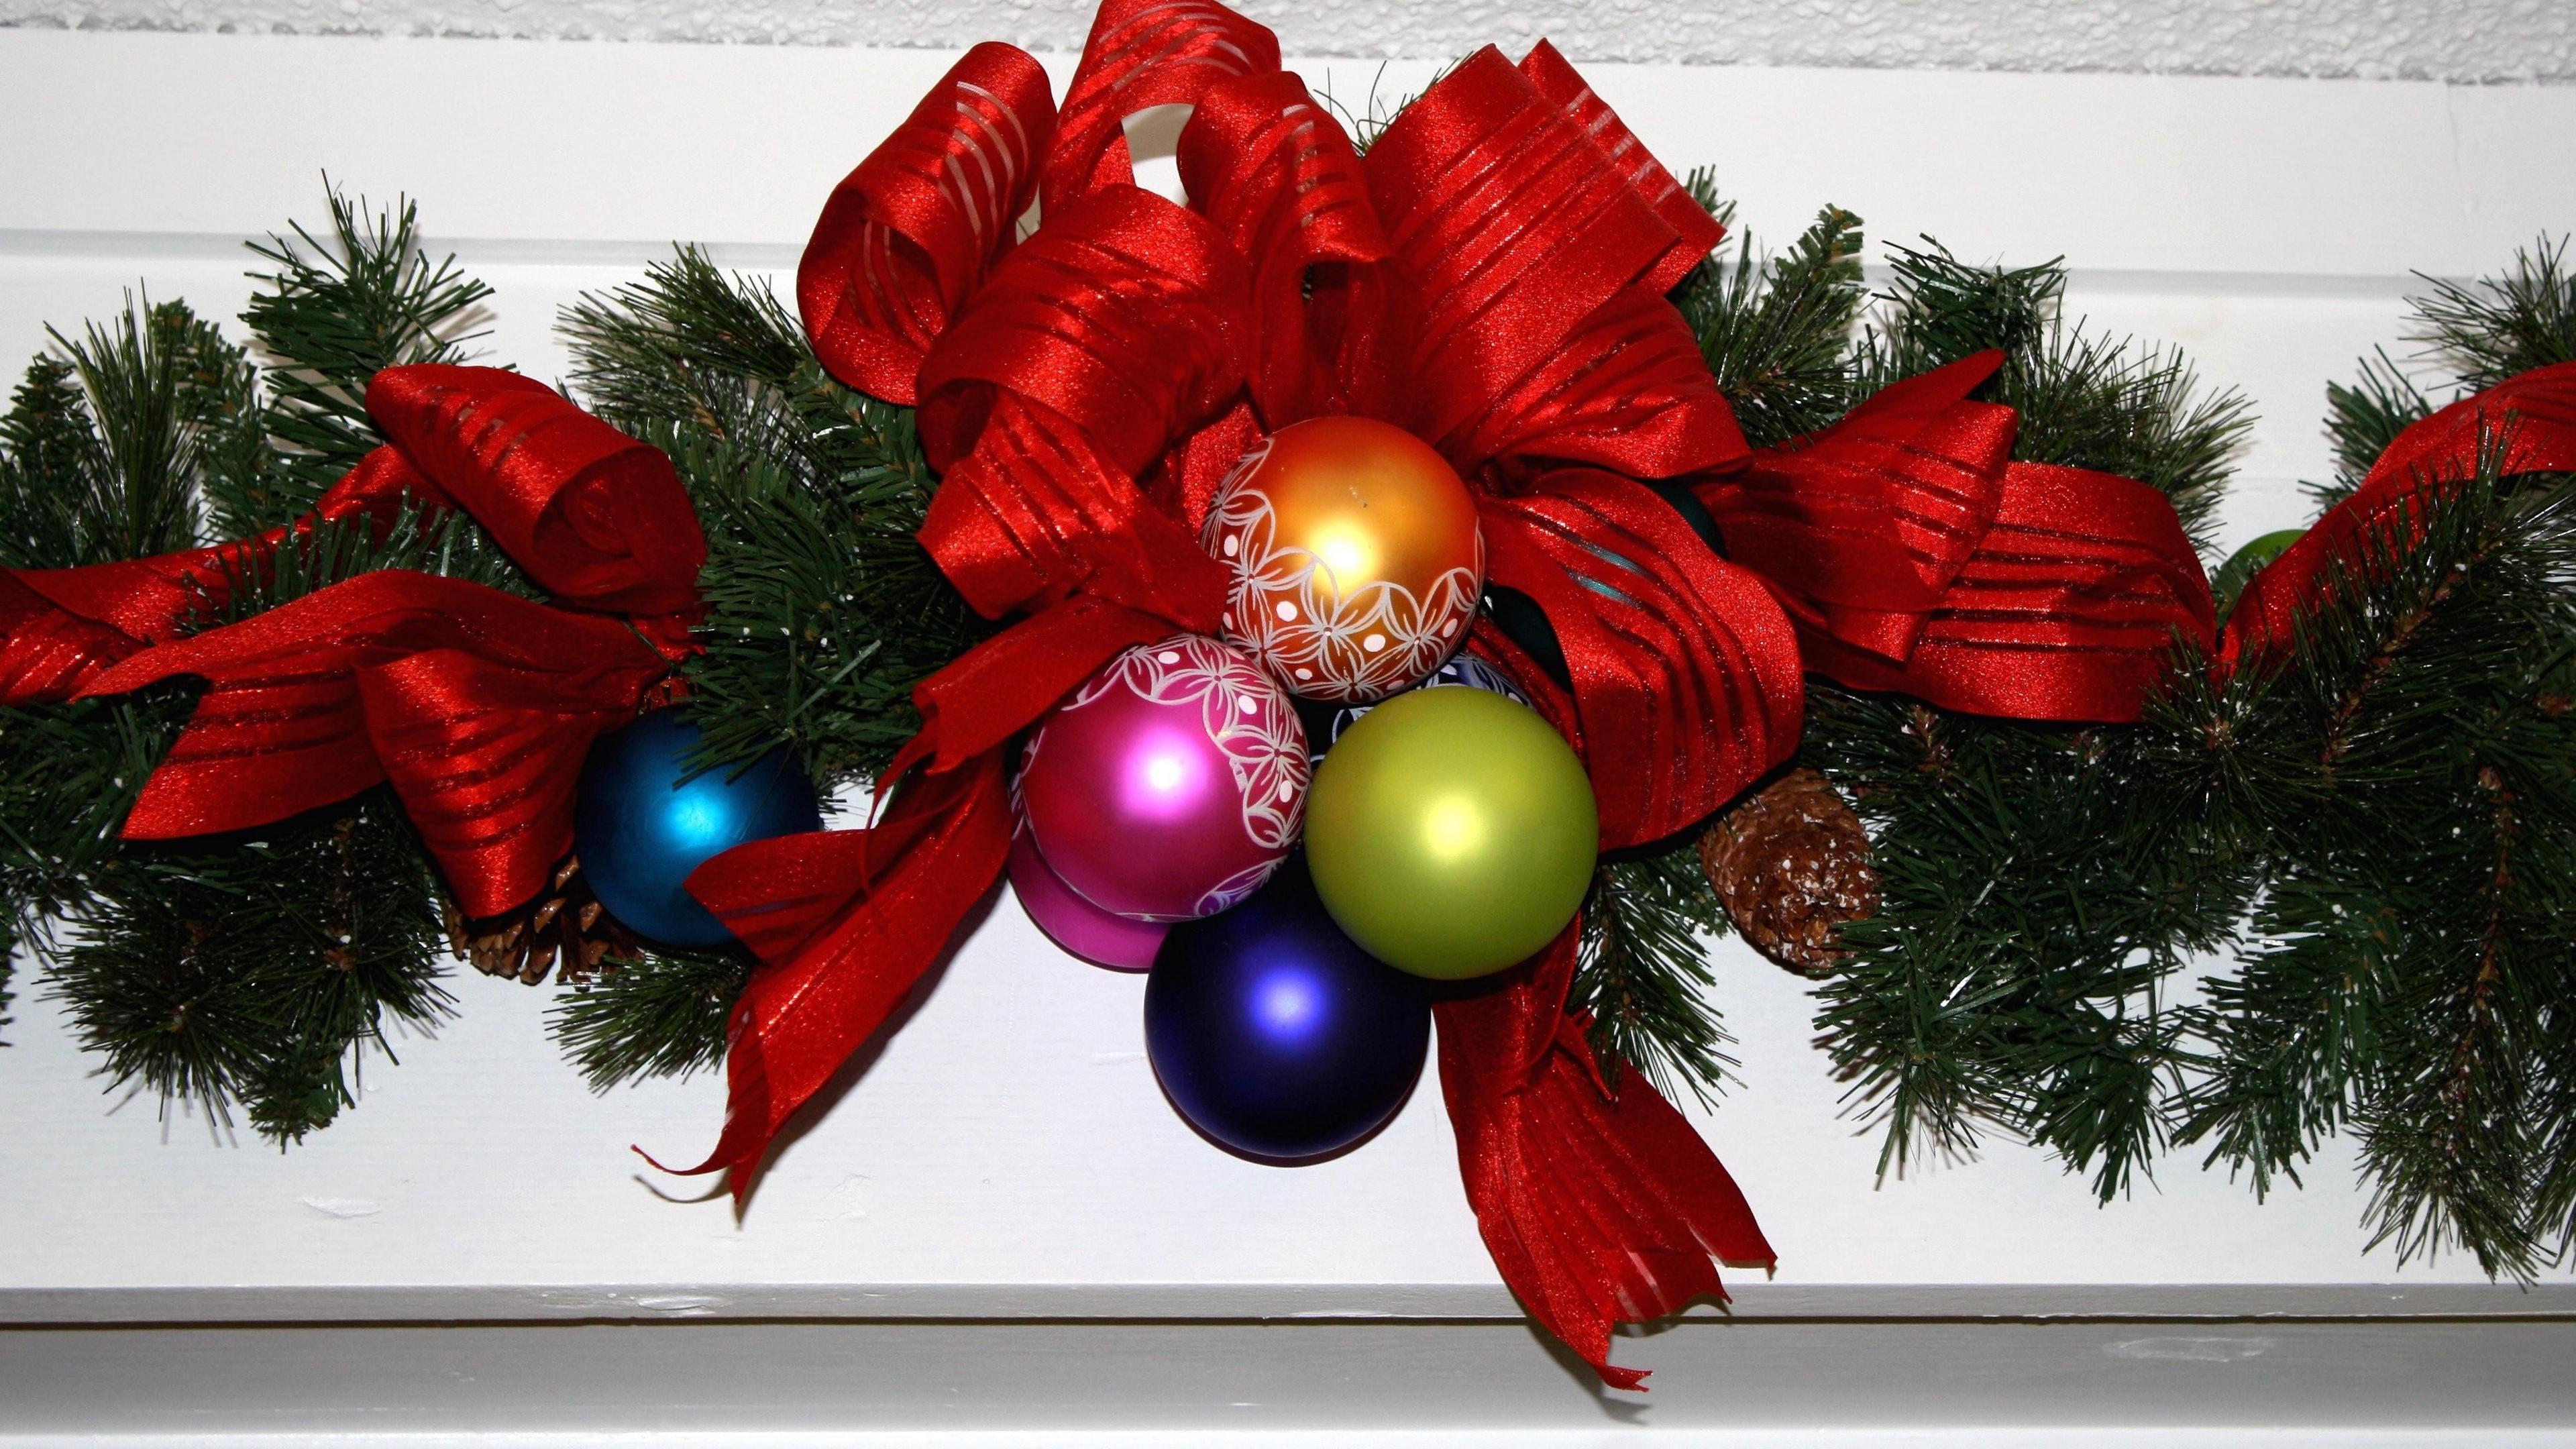 christmas new year needles christmas decorations ribbon decoration 4k 1538344624 - christmas, new year, needles, christmas decorations, ribbon, decoration 4k - new year, needles, Christmas